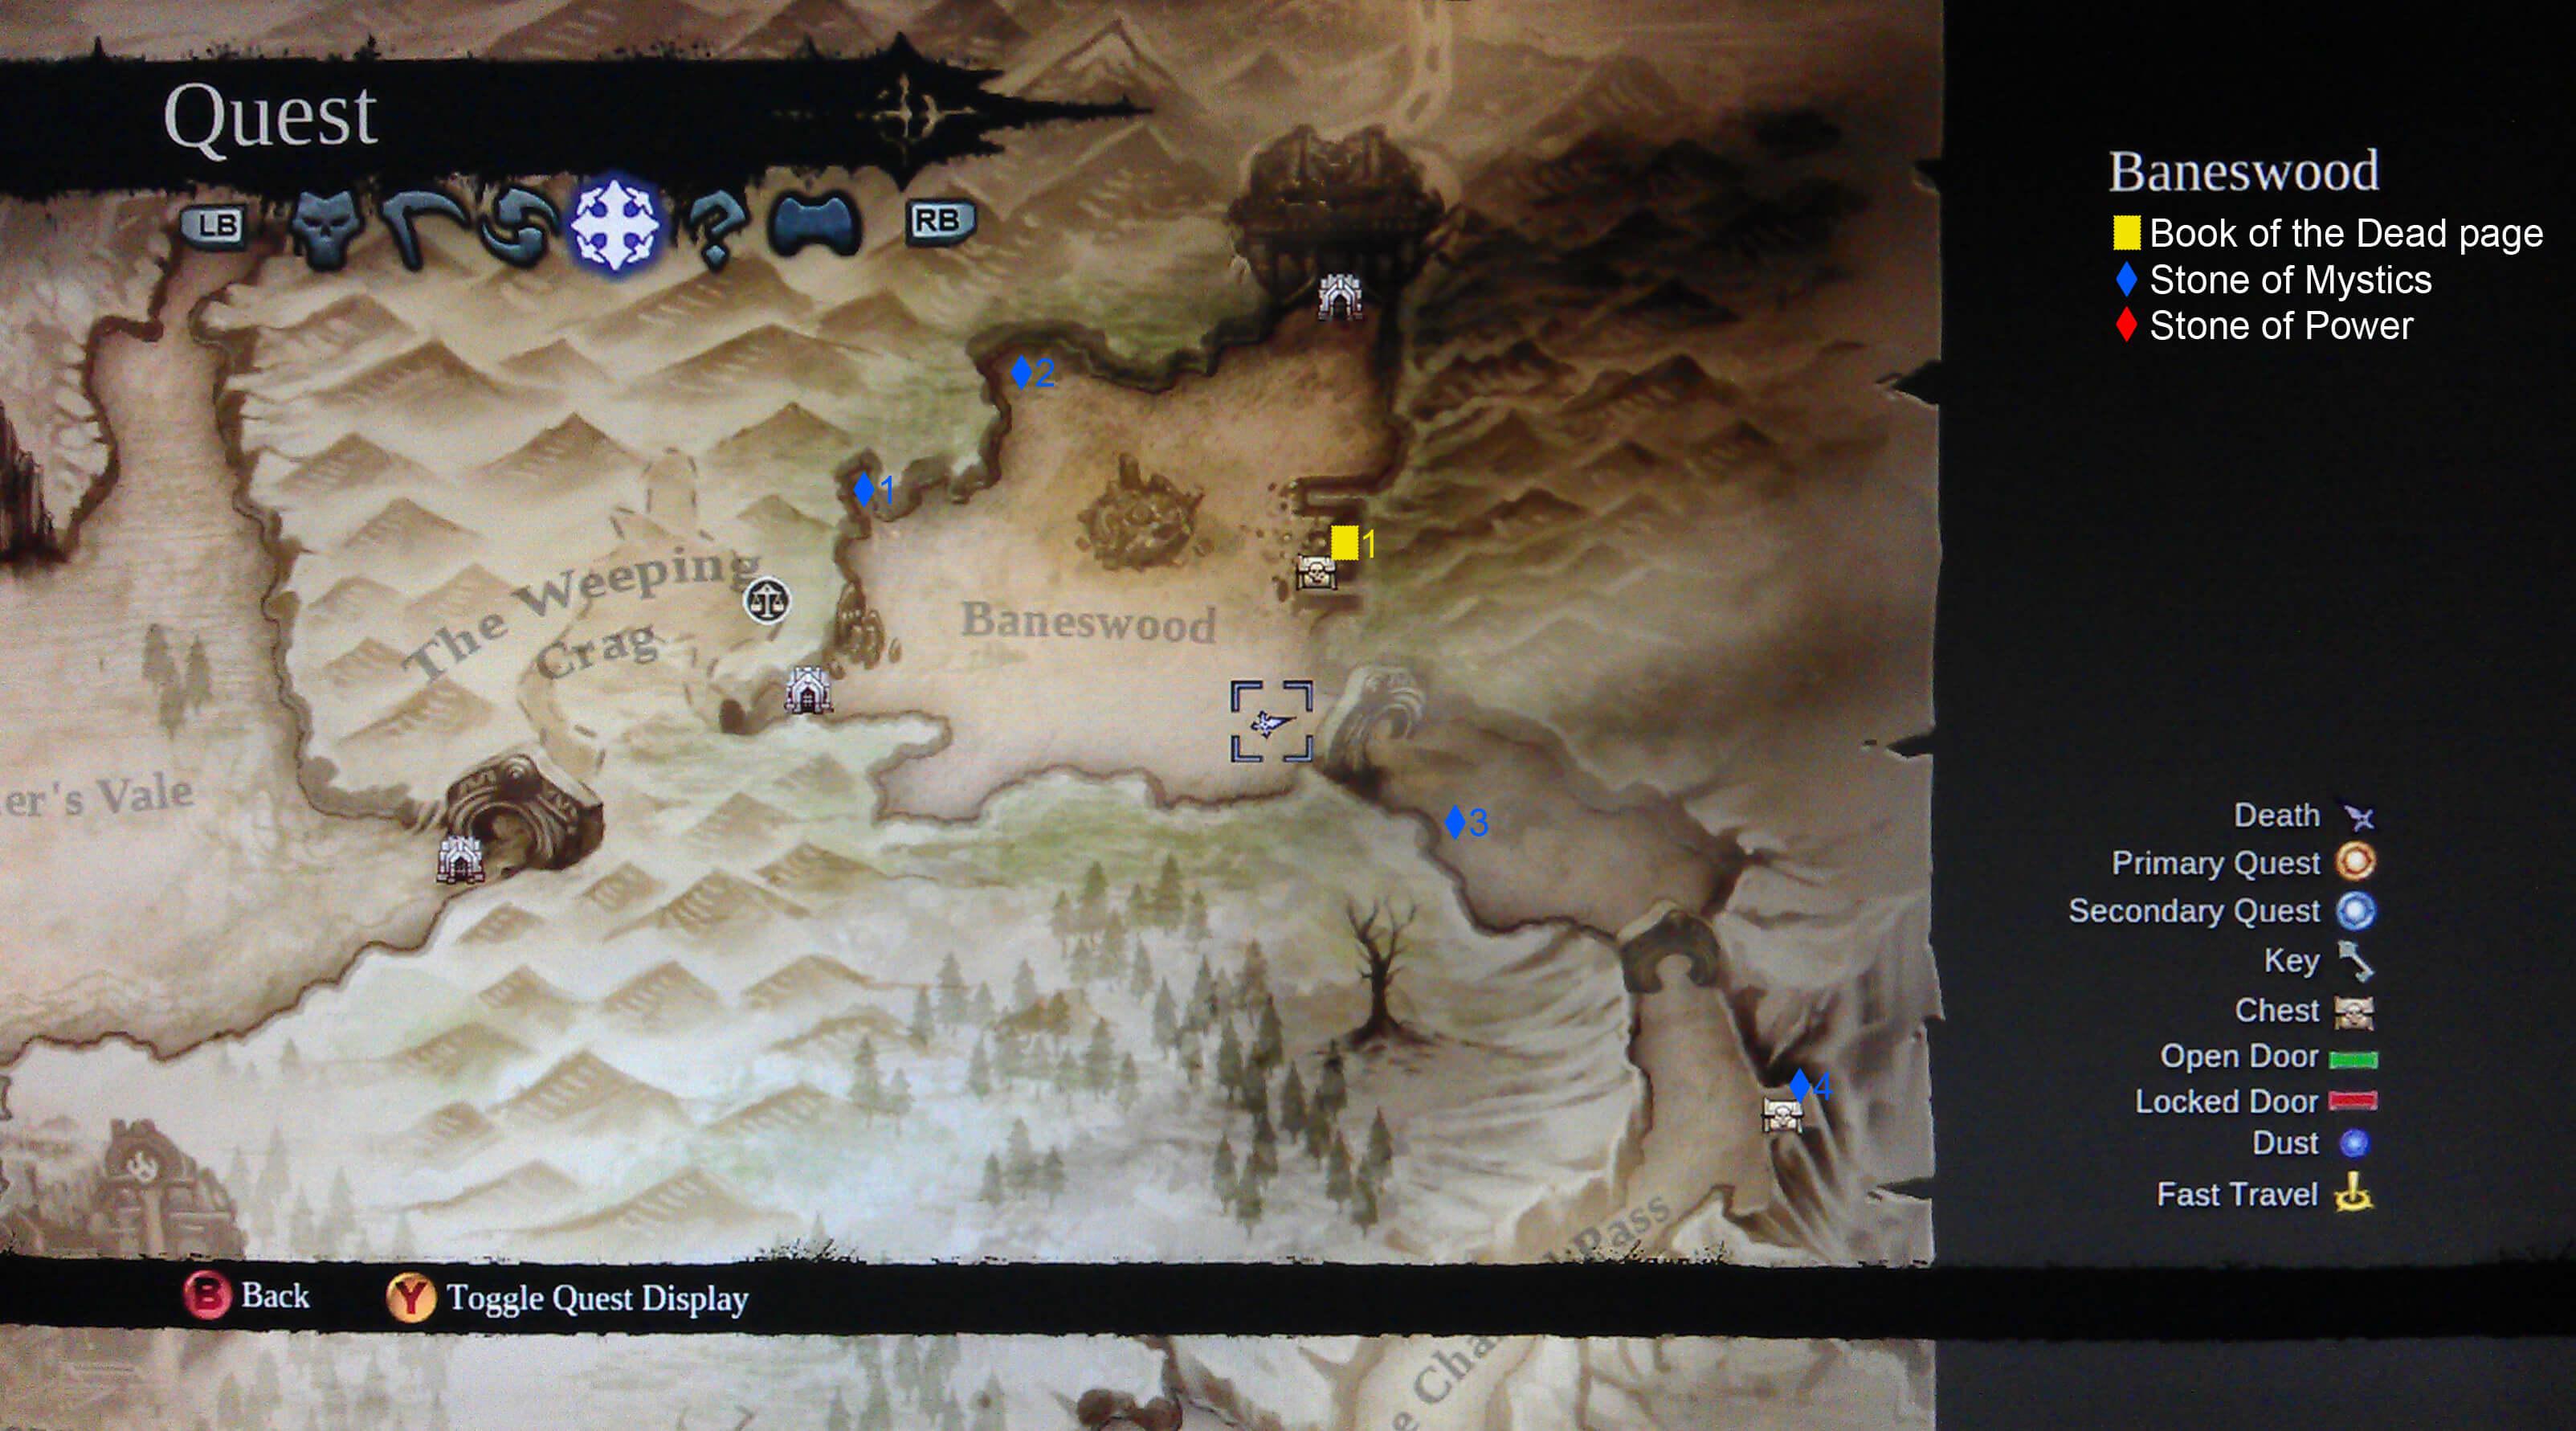 Darksiders II Baneswood Collectibles Map